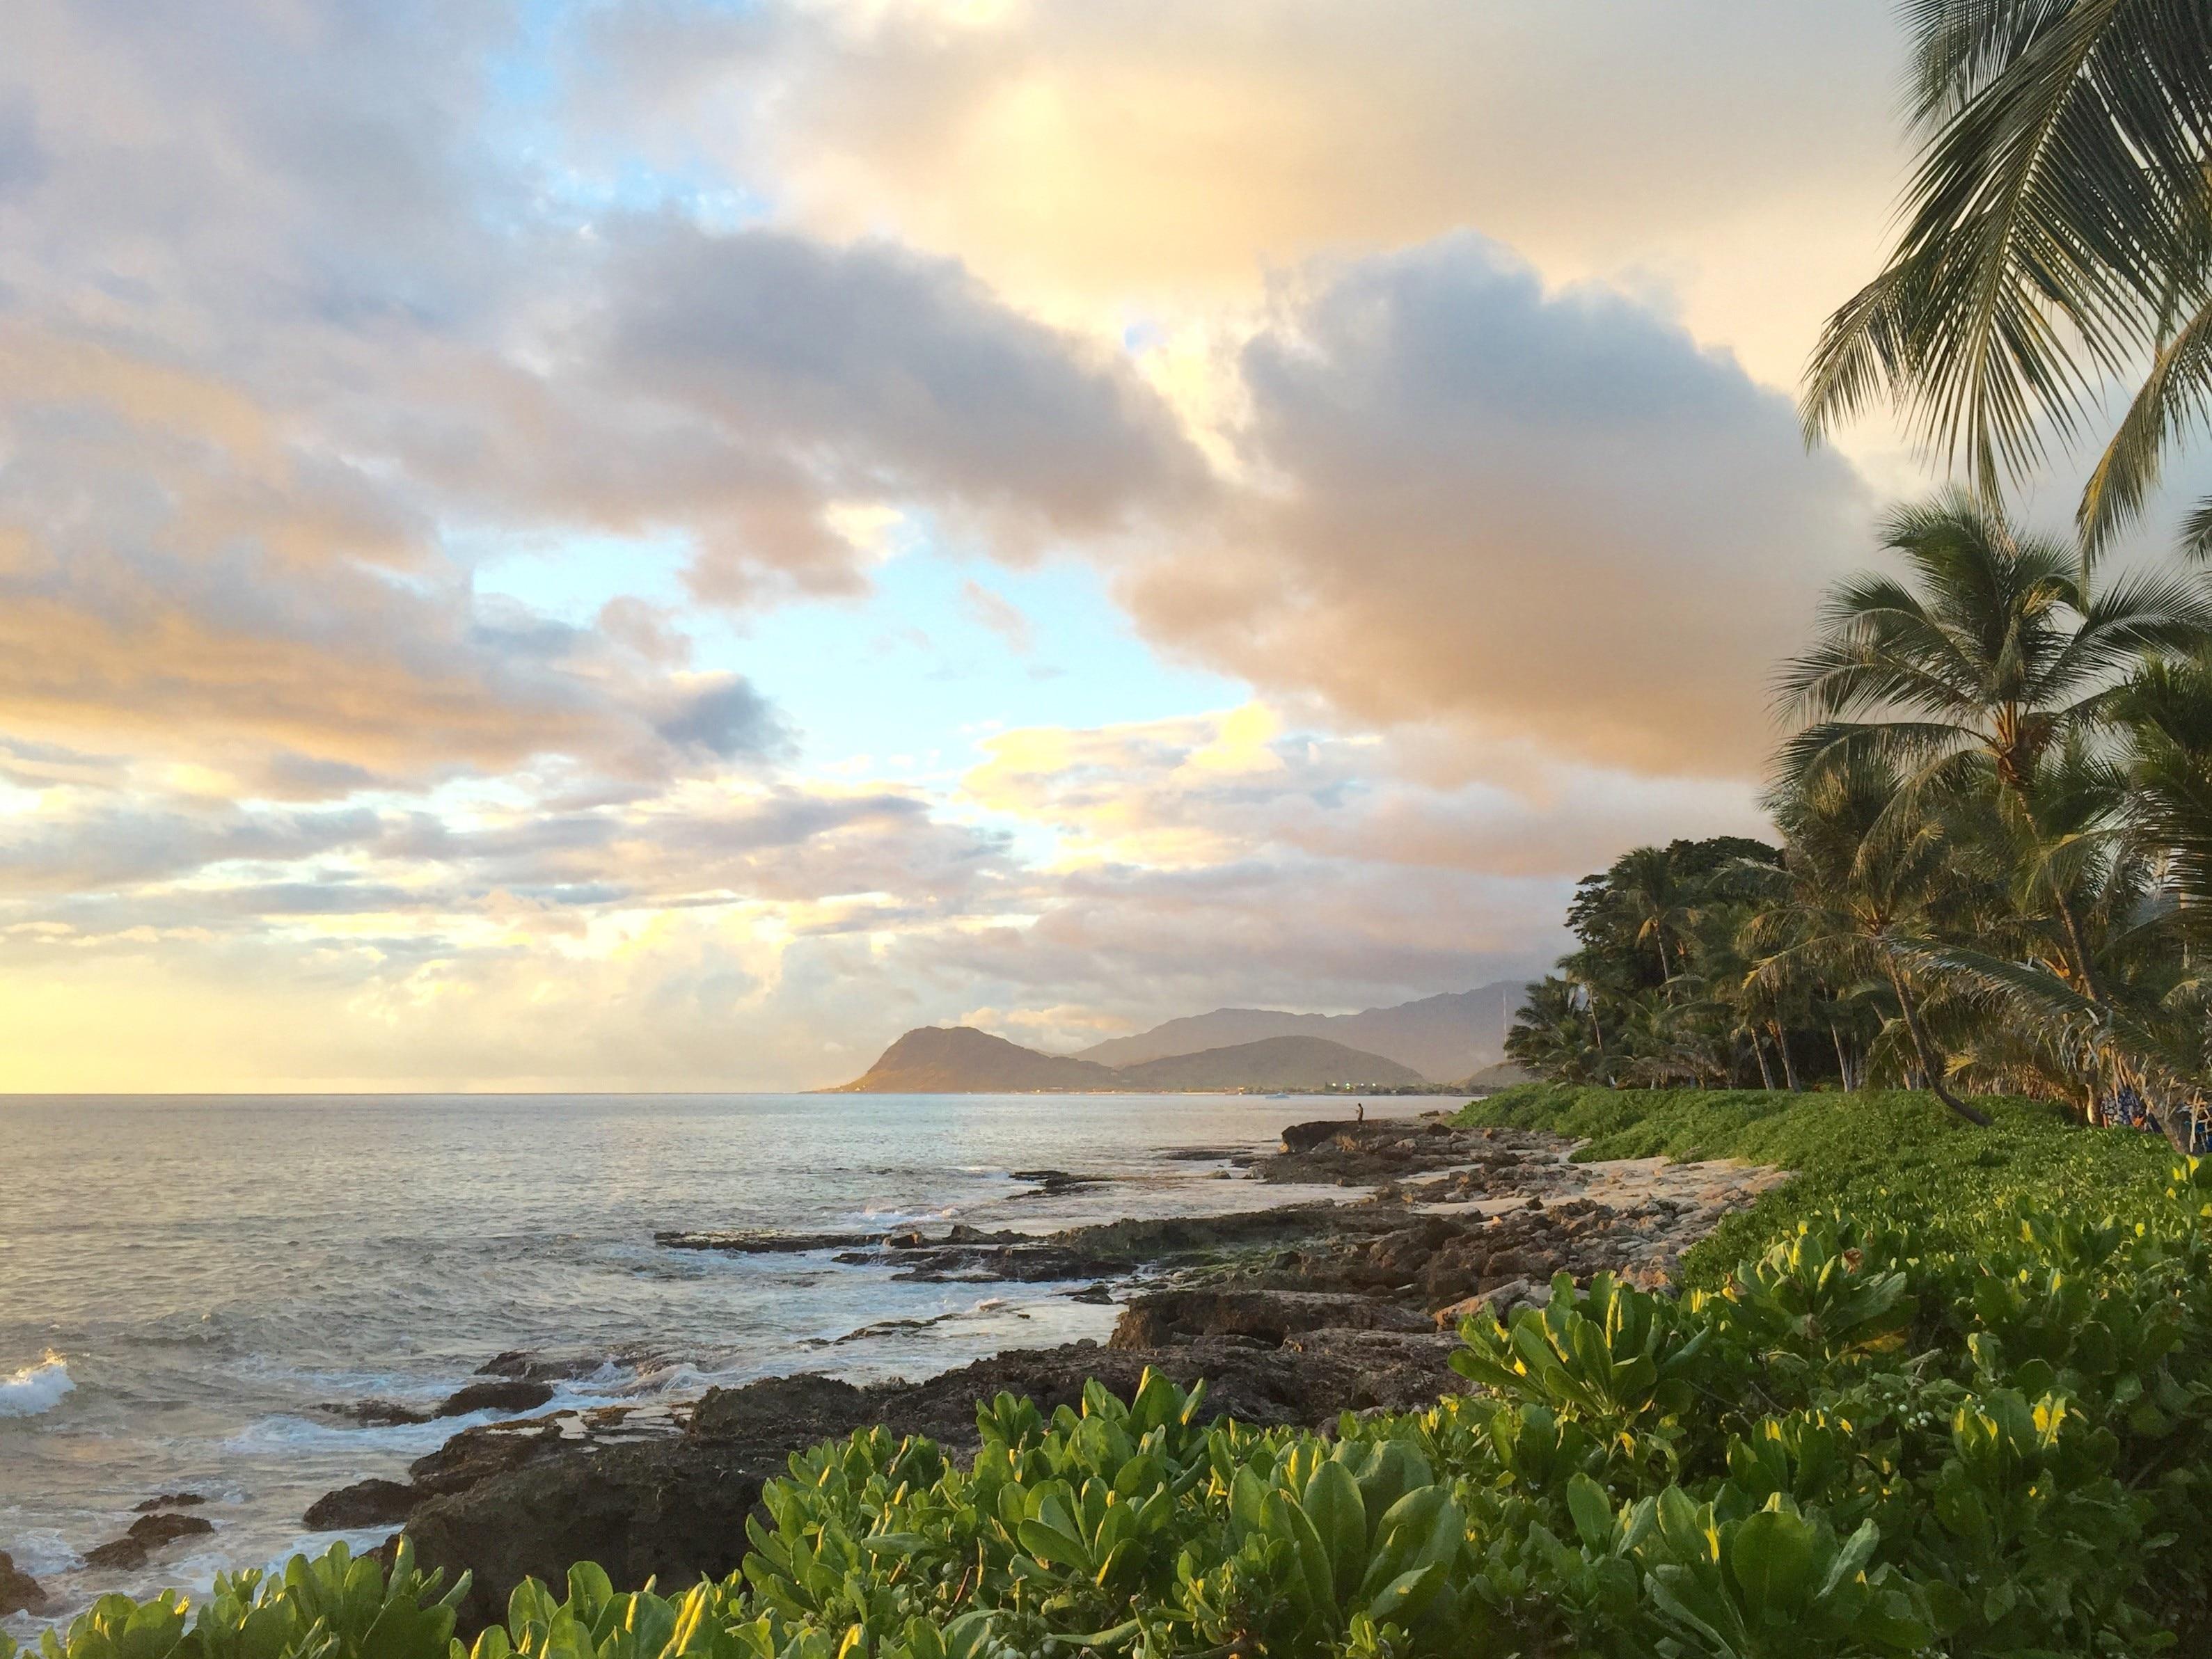 Paradise Cove Beach, Kapolei, Hawaii, USA